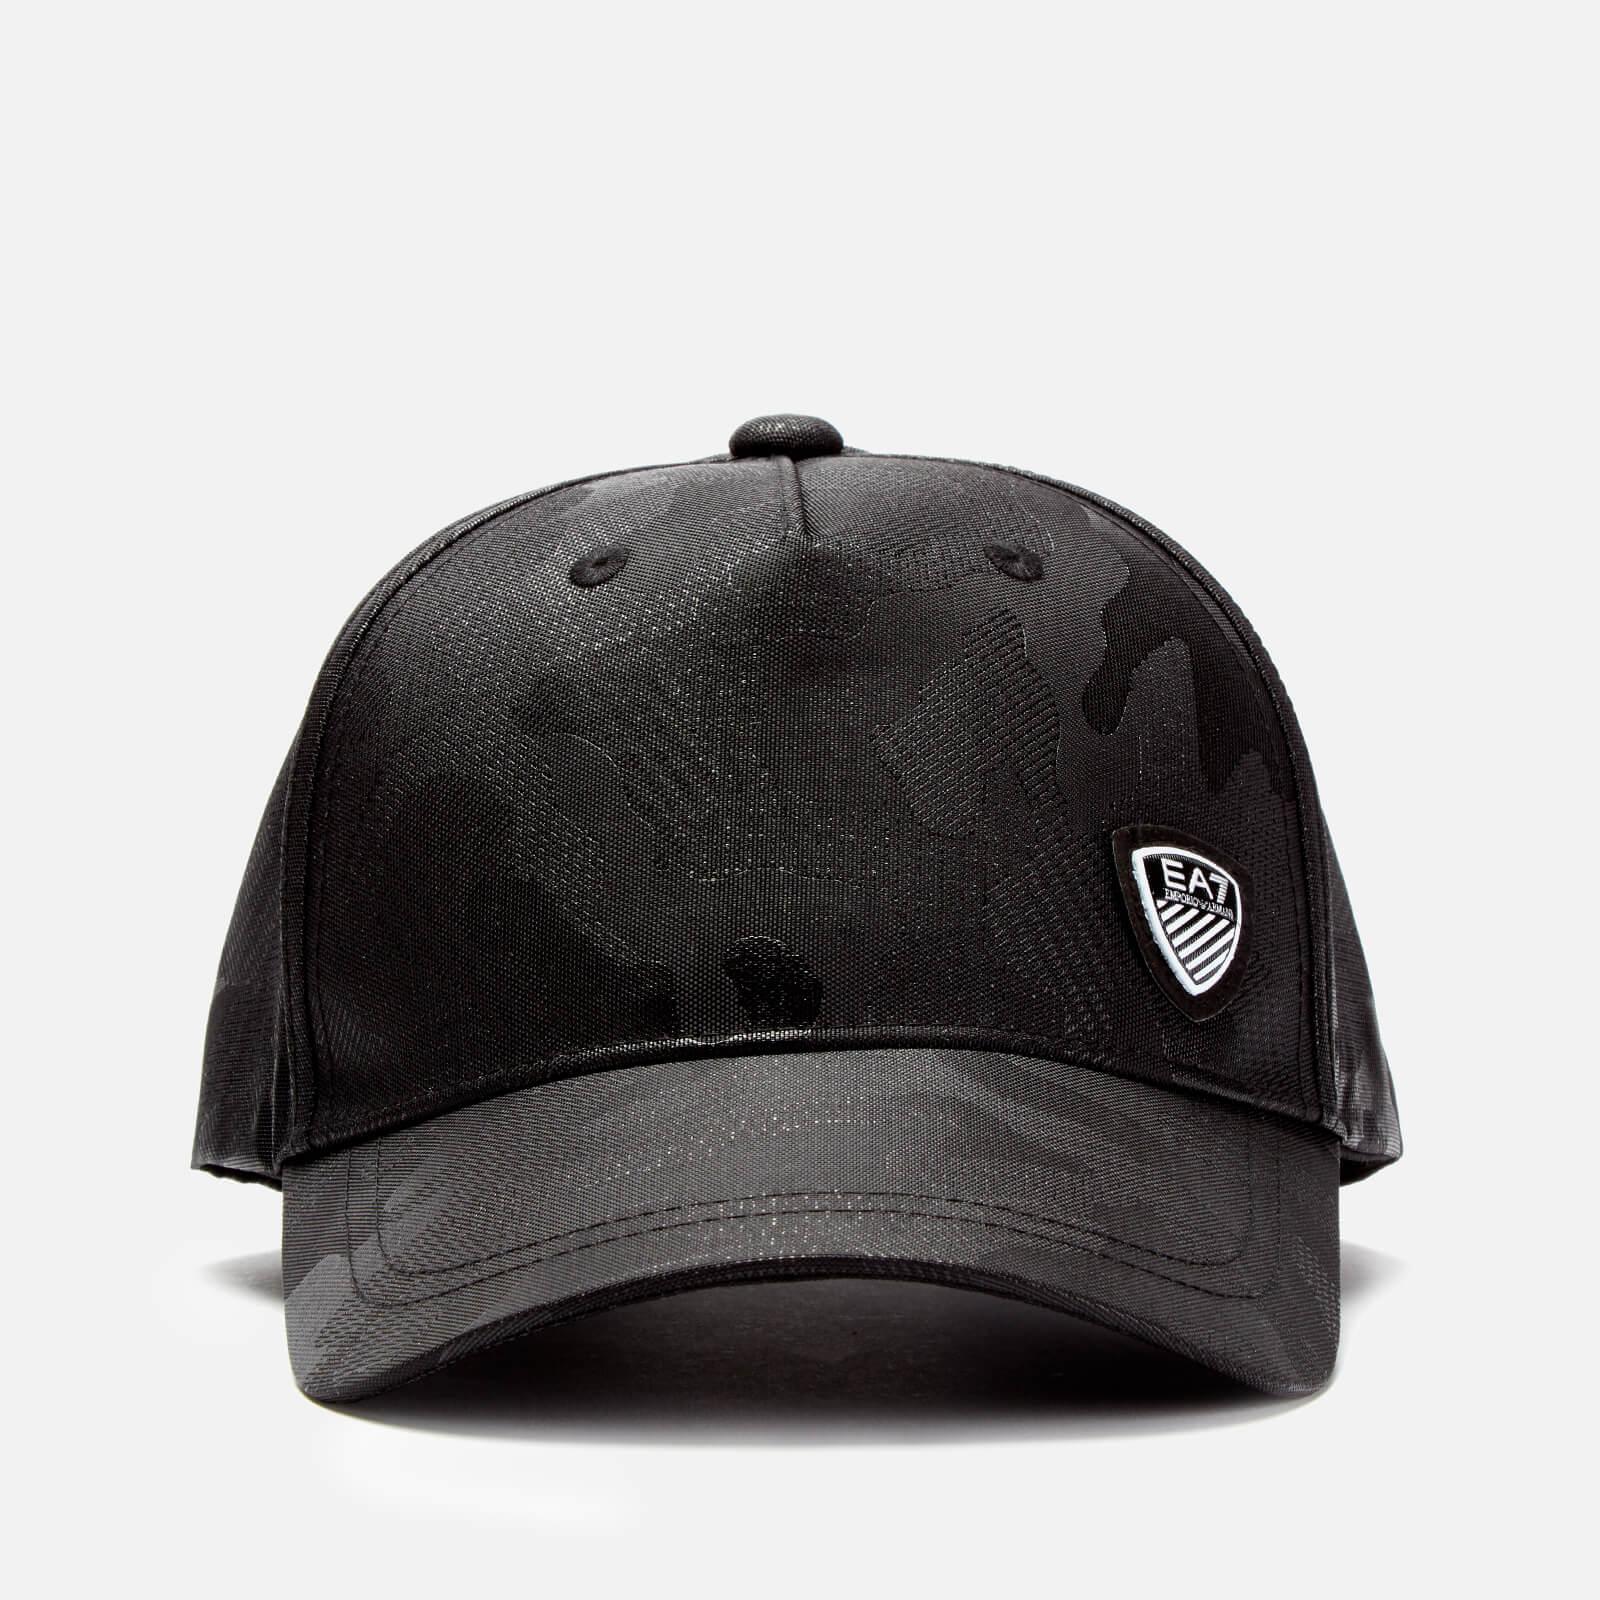 941b78804 Lyst - EA7 Train Soccer Cap in Black for Men